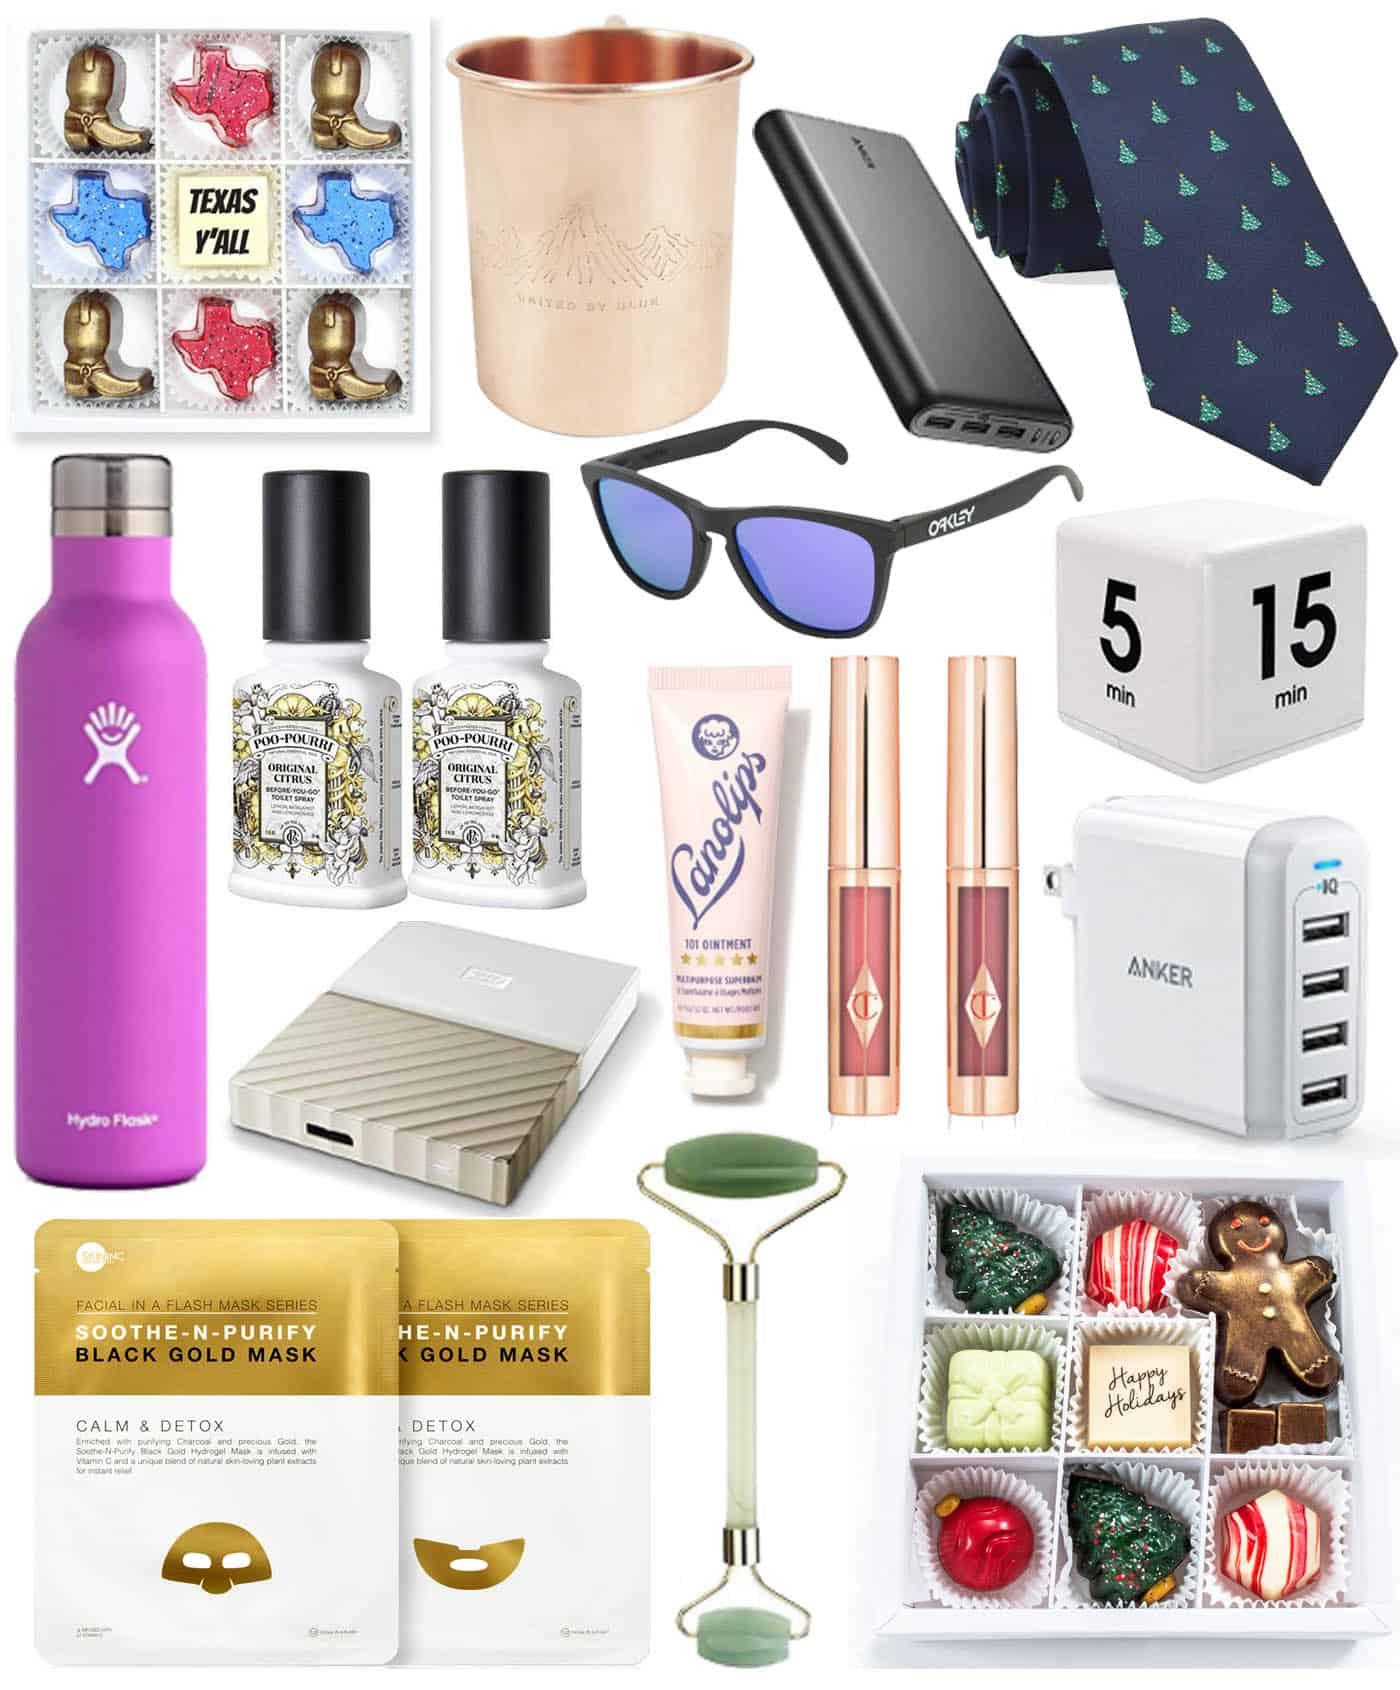 15 Stocking Stuffer Ideas For Him & Her